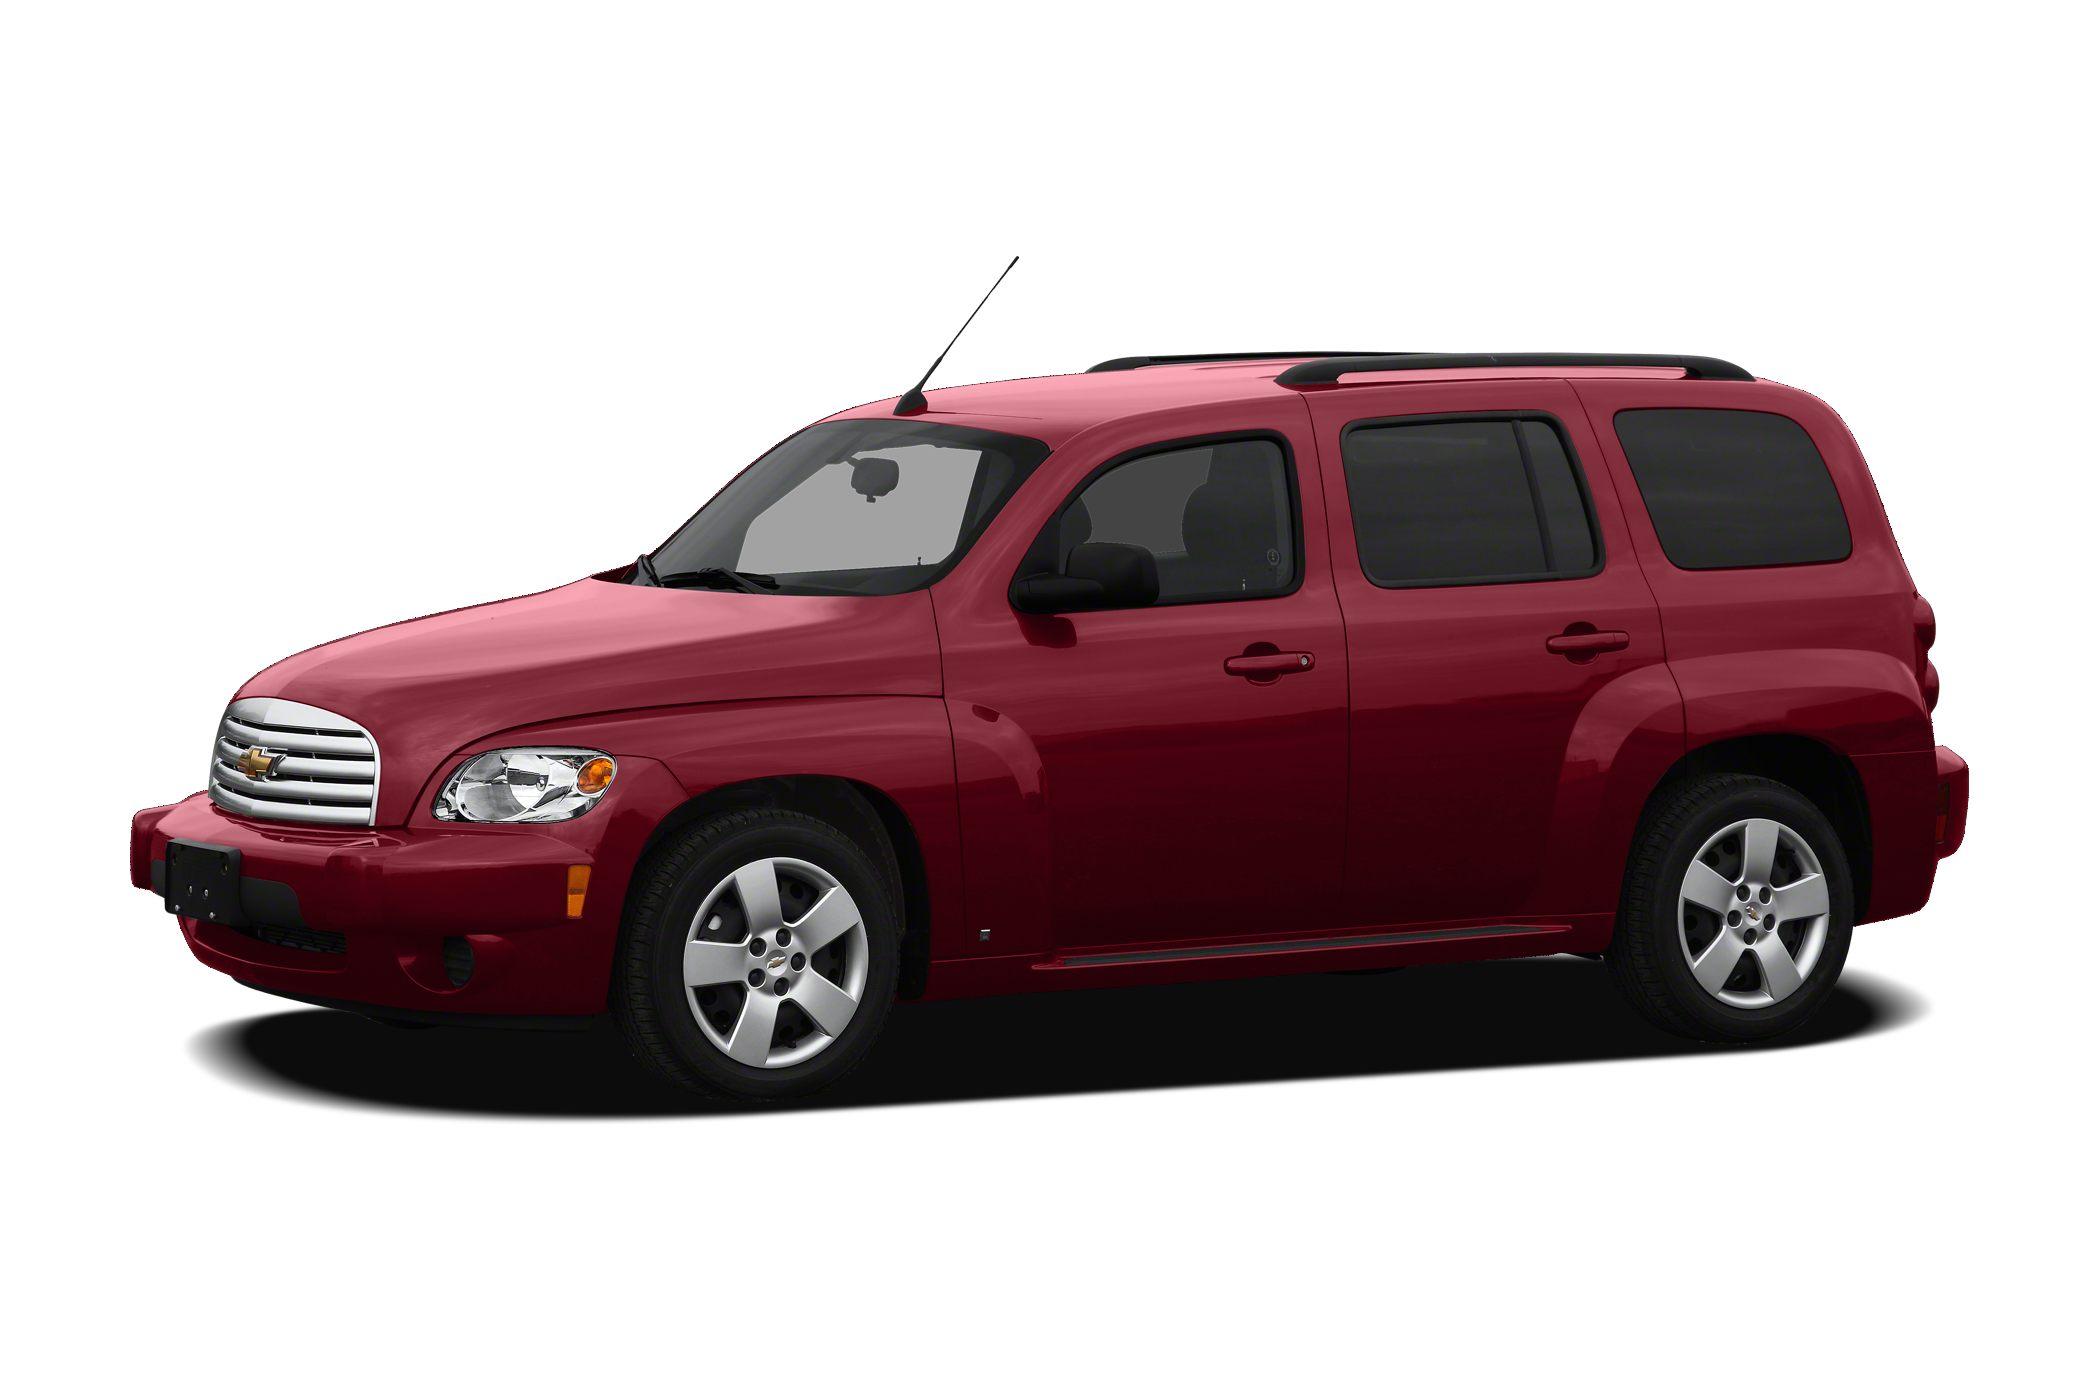 Chevrolet HHR News, Photos and Buying Information - Autoblog